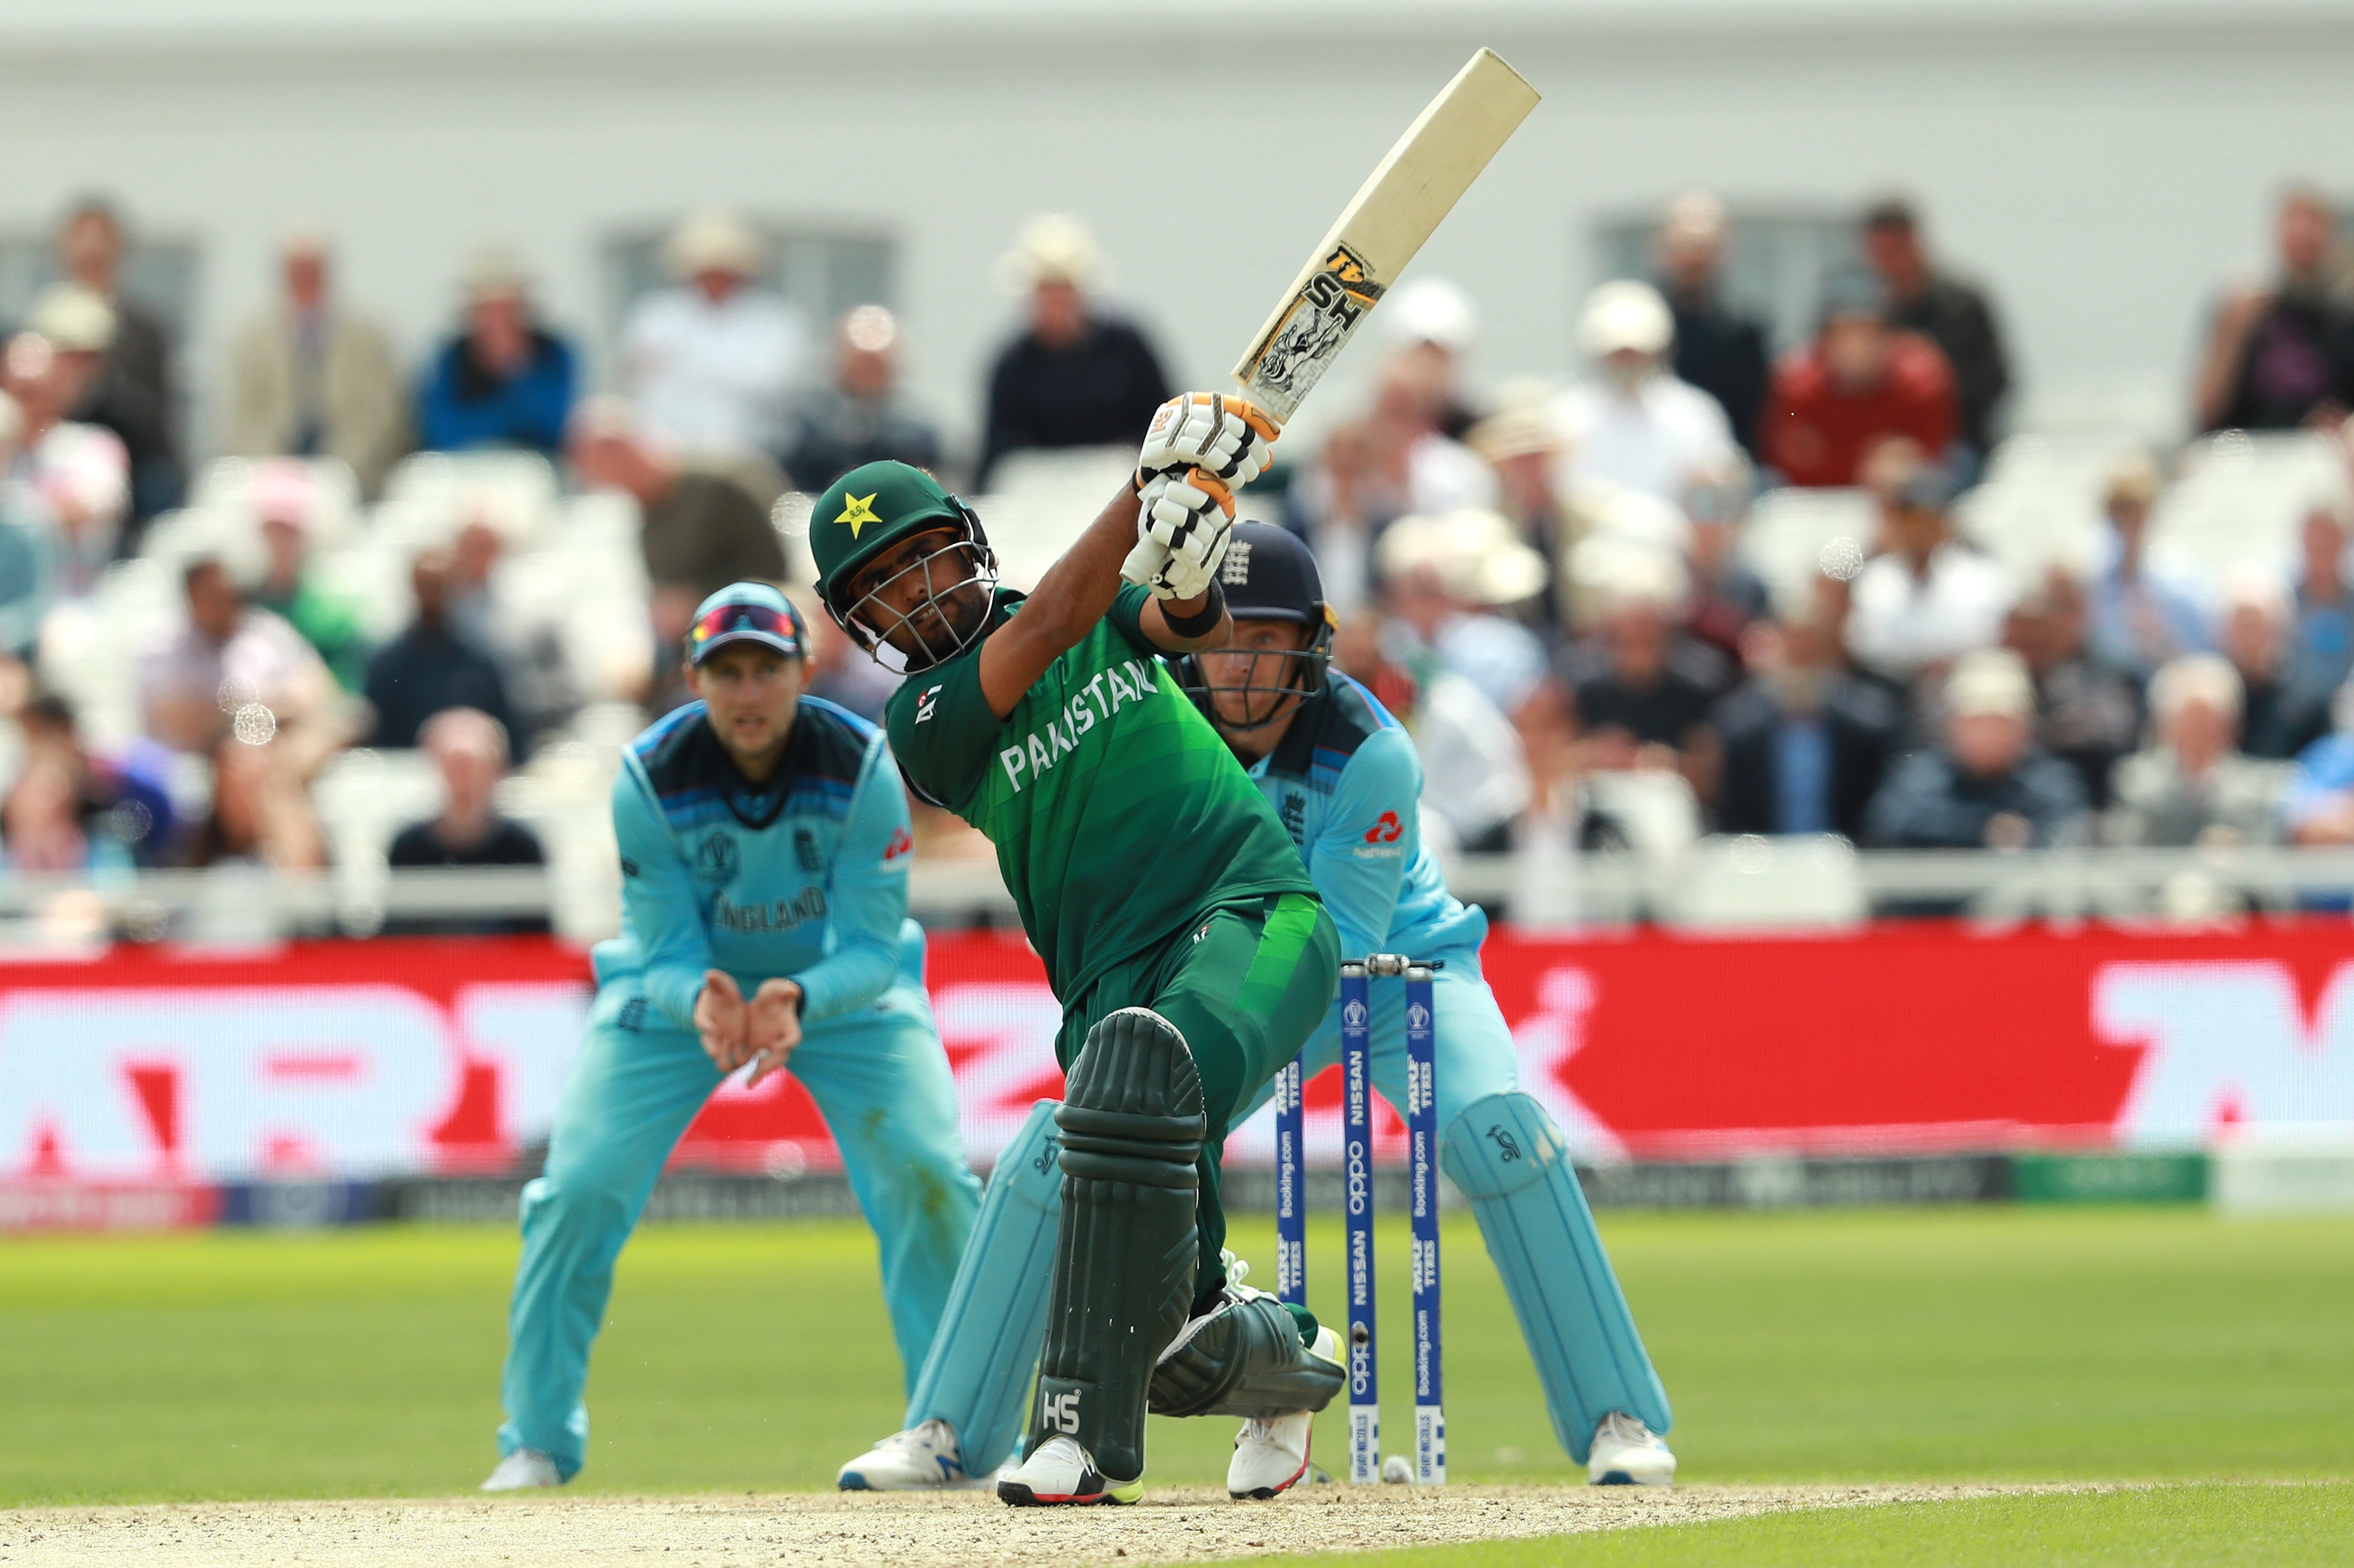 ICC - International Cricket Council